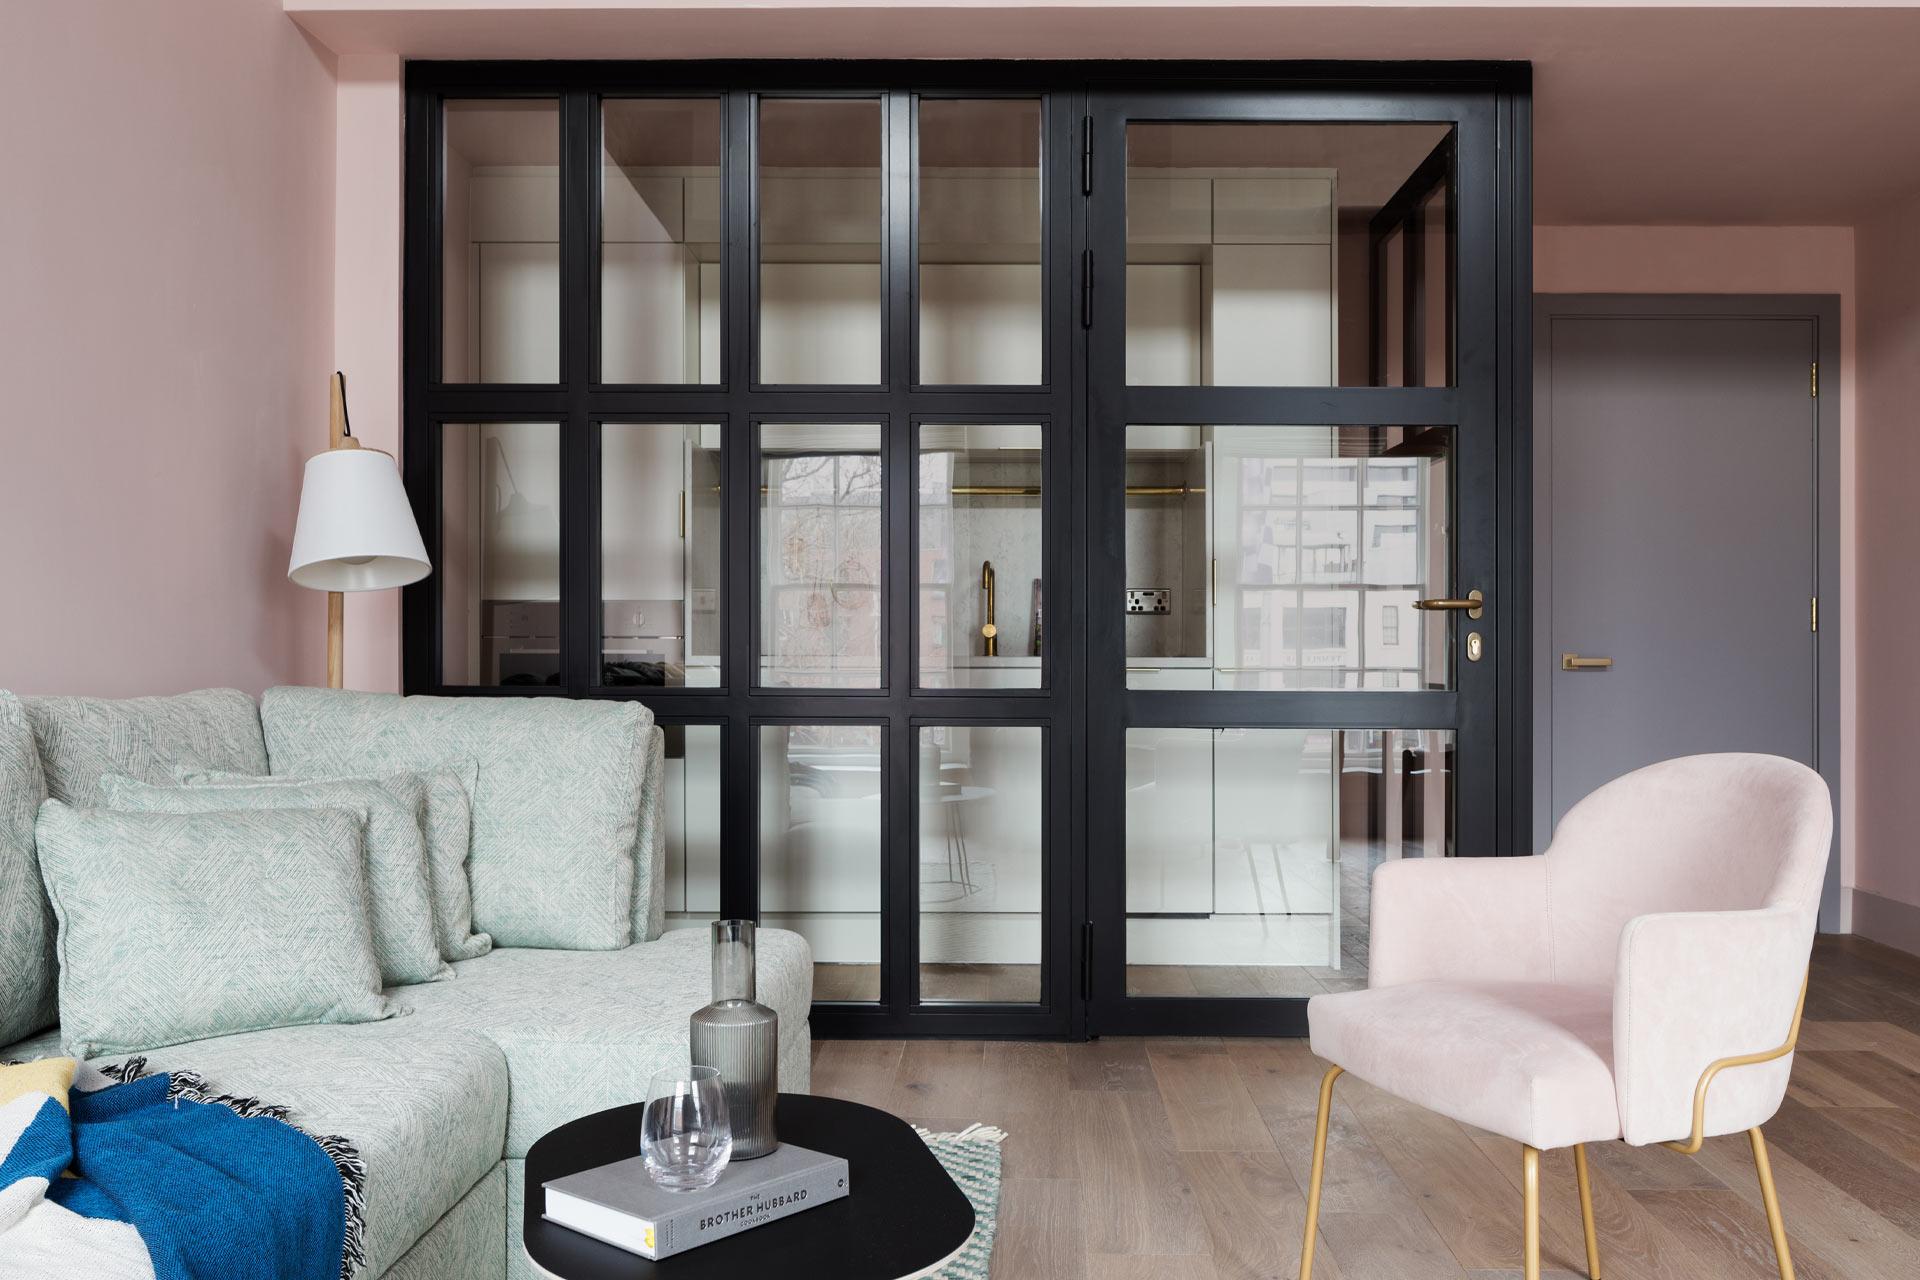 A studio apartment at Zanzibar Locke in Dublin